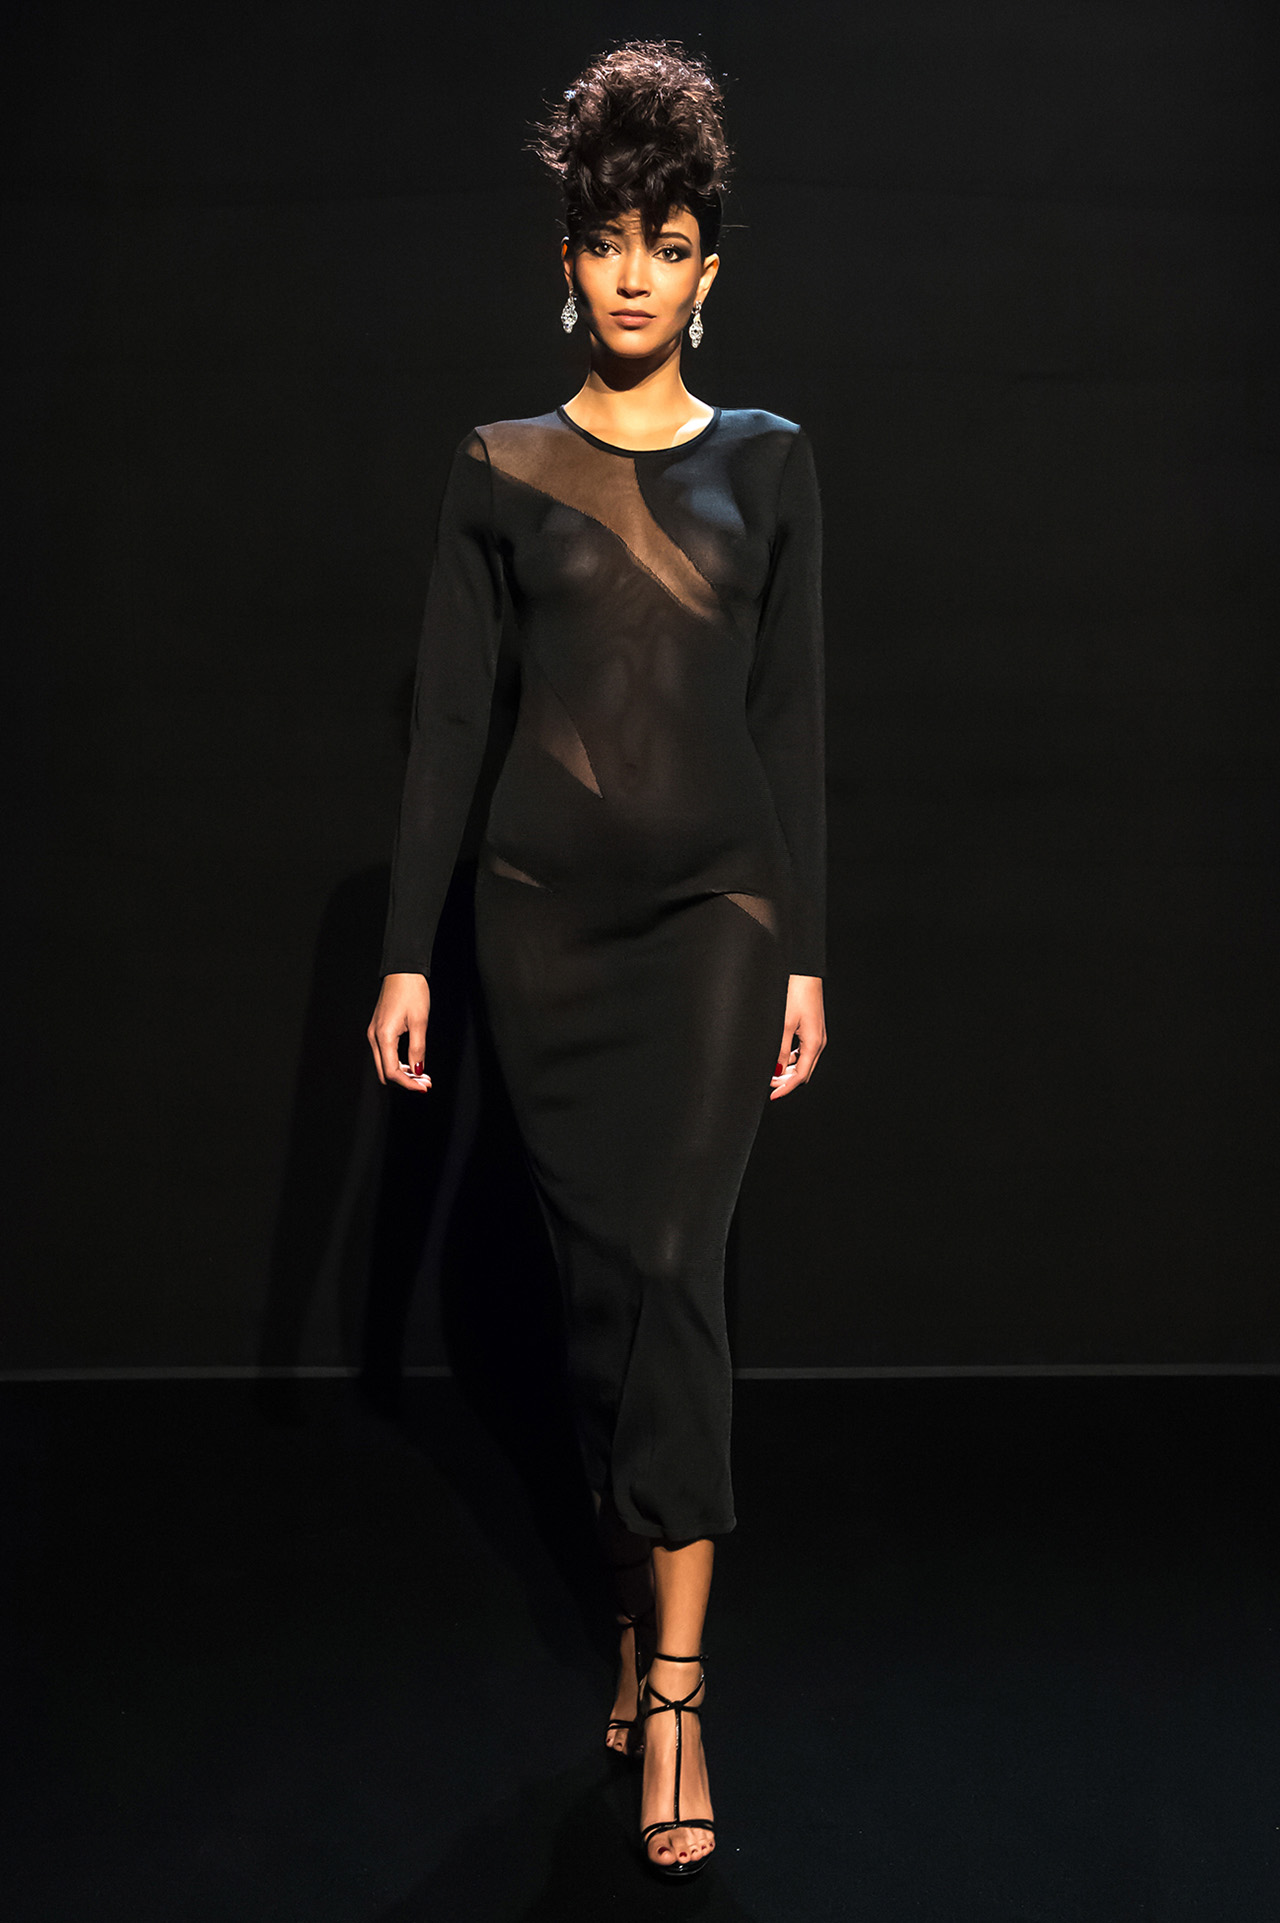 Daniela de Jesus for Azzaro Spring 2017 Couture